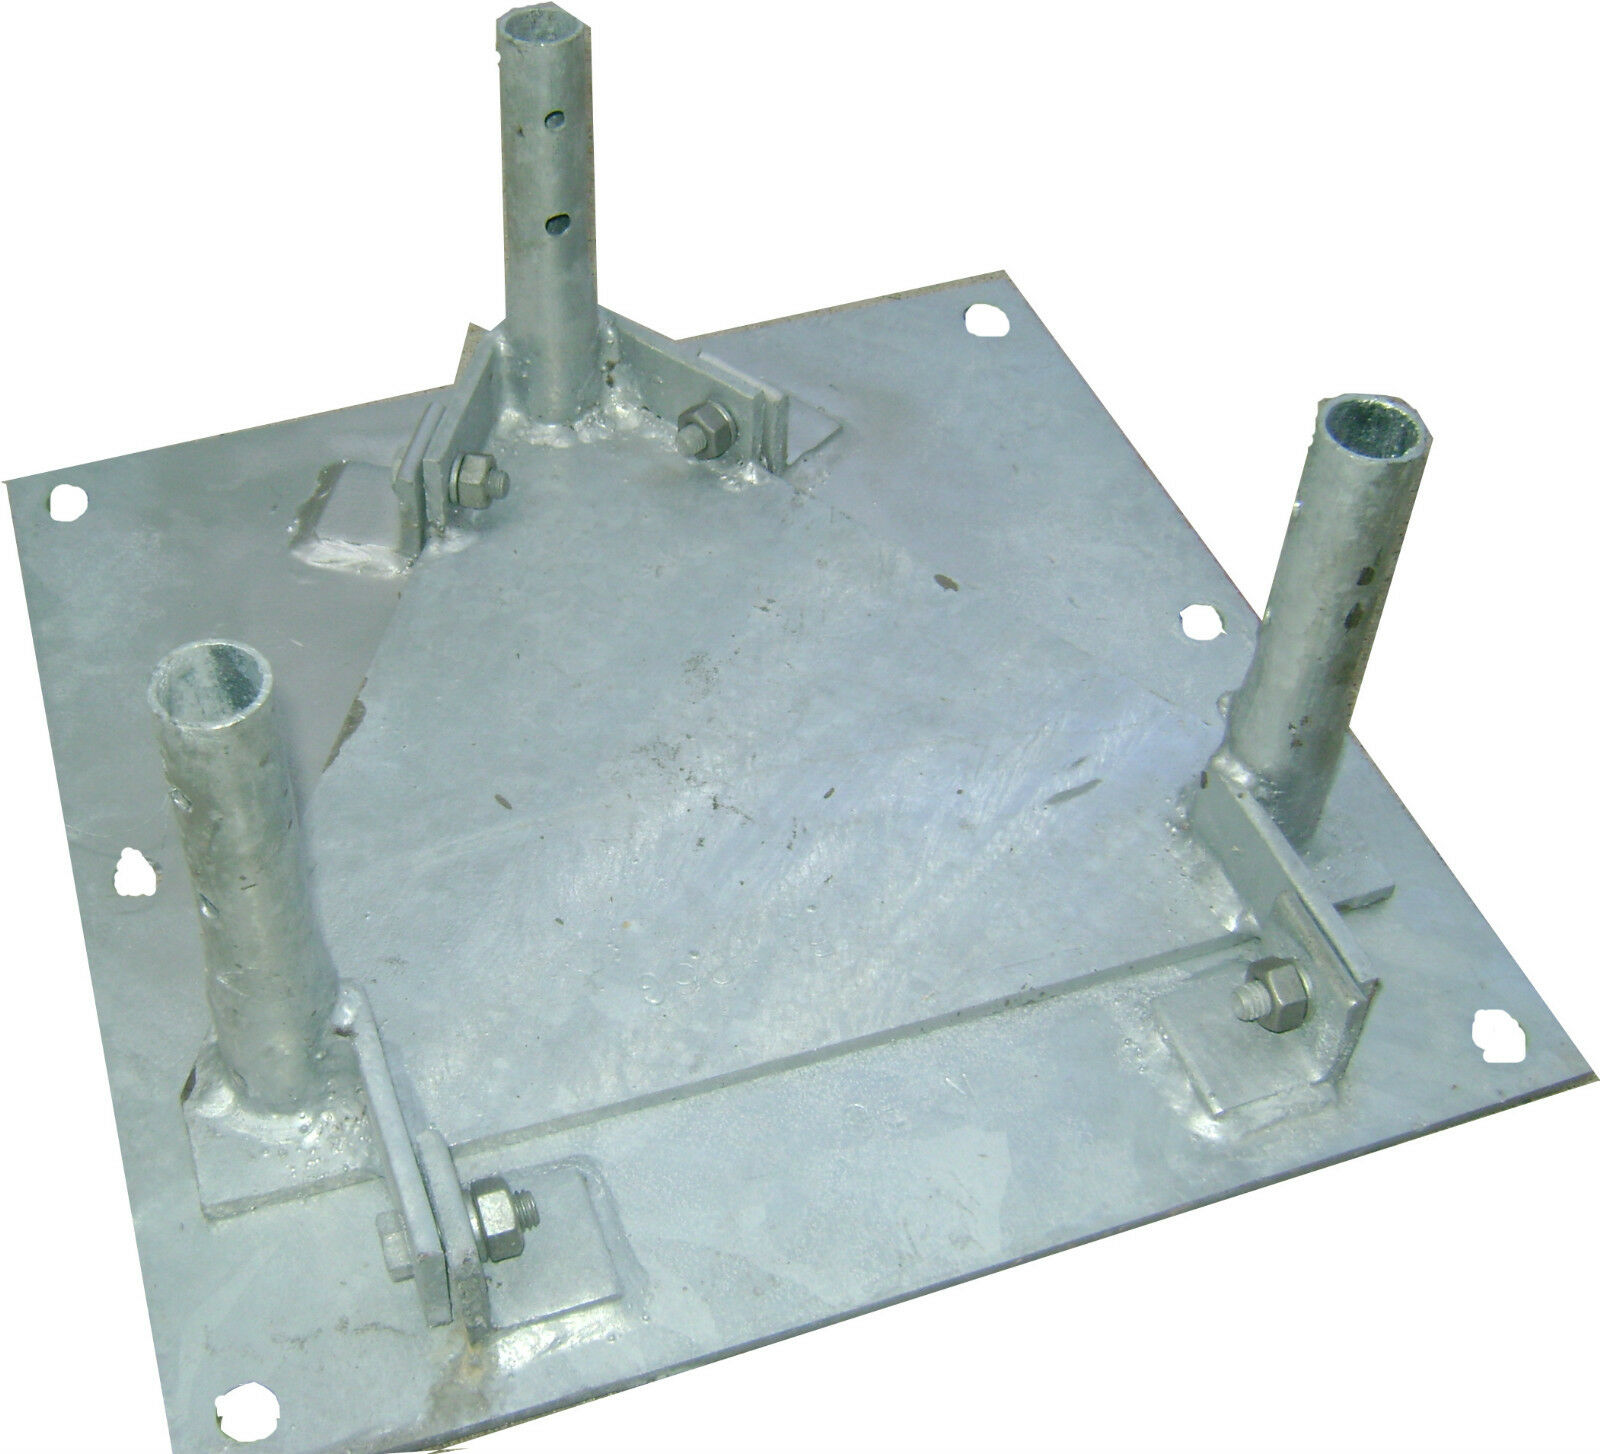 R-BPH25G antennapartsoutlet1 ROHN BPH25G Hinged Base Plate for 25G Towers ** R-BPH25G ** Genuine OEM Product